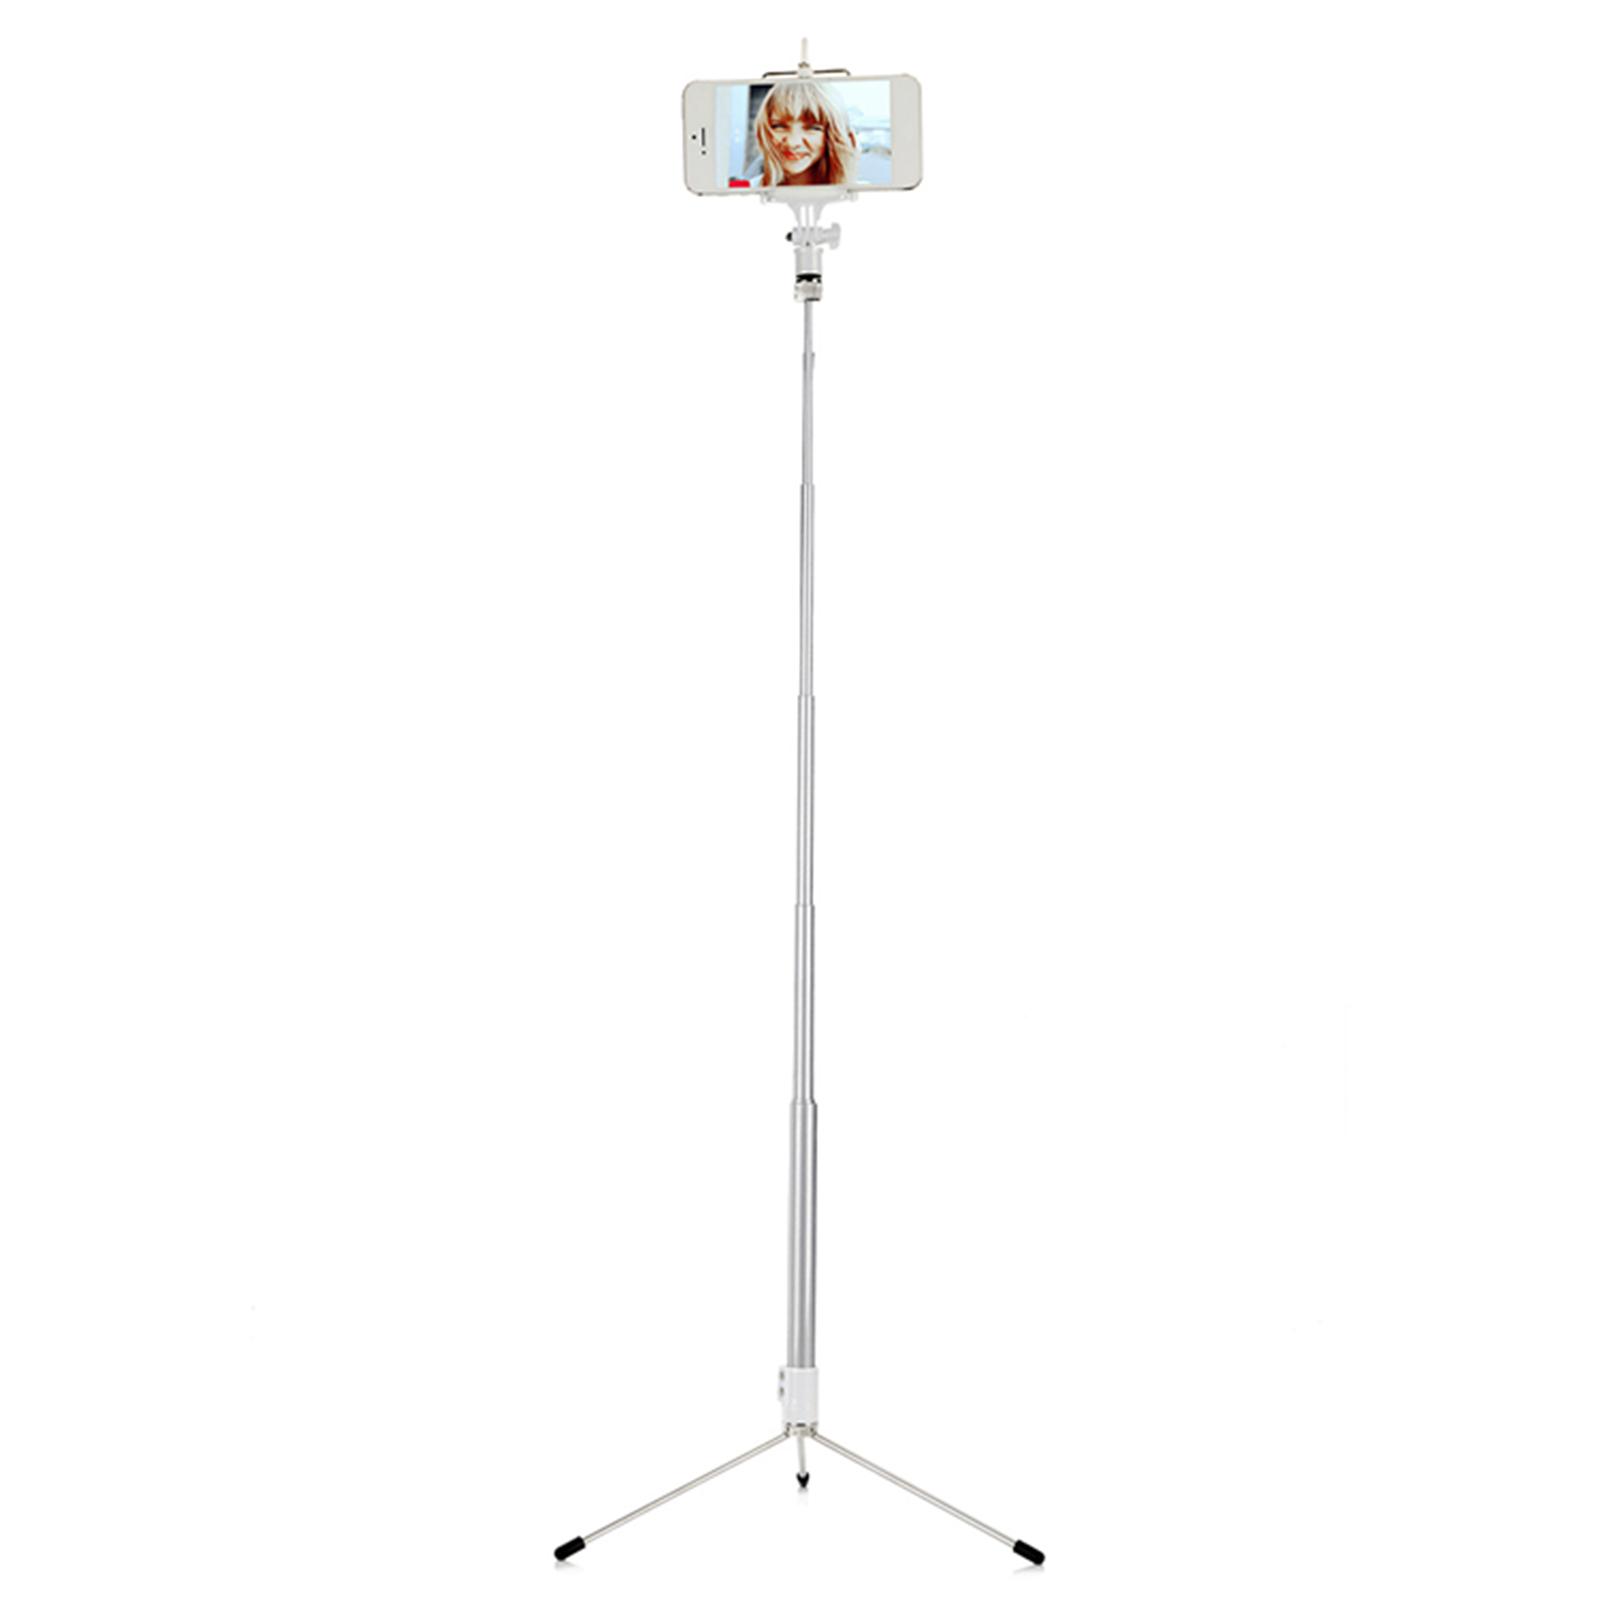 dispho photo taking holder selfie stick handheld bluetooth wireless with tripod. Black Bedroom Furniture Sets. Home Design Ideas